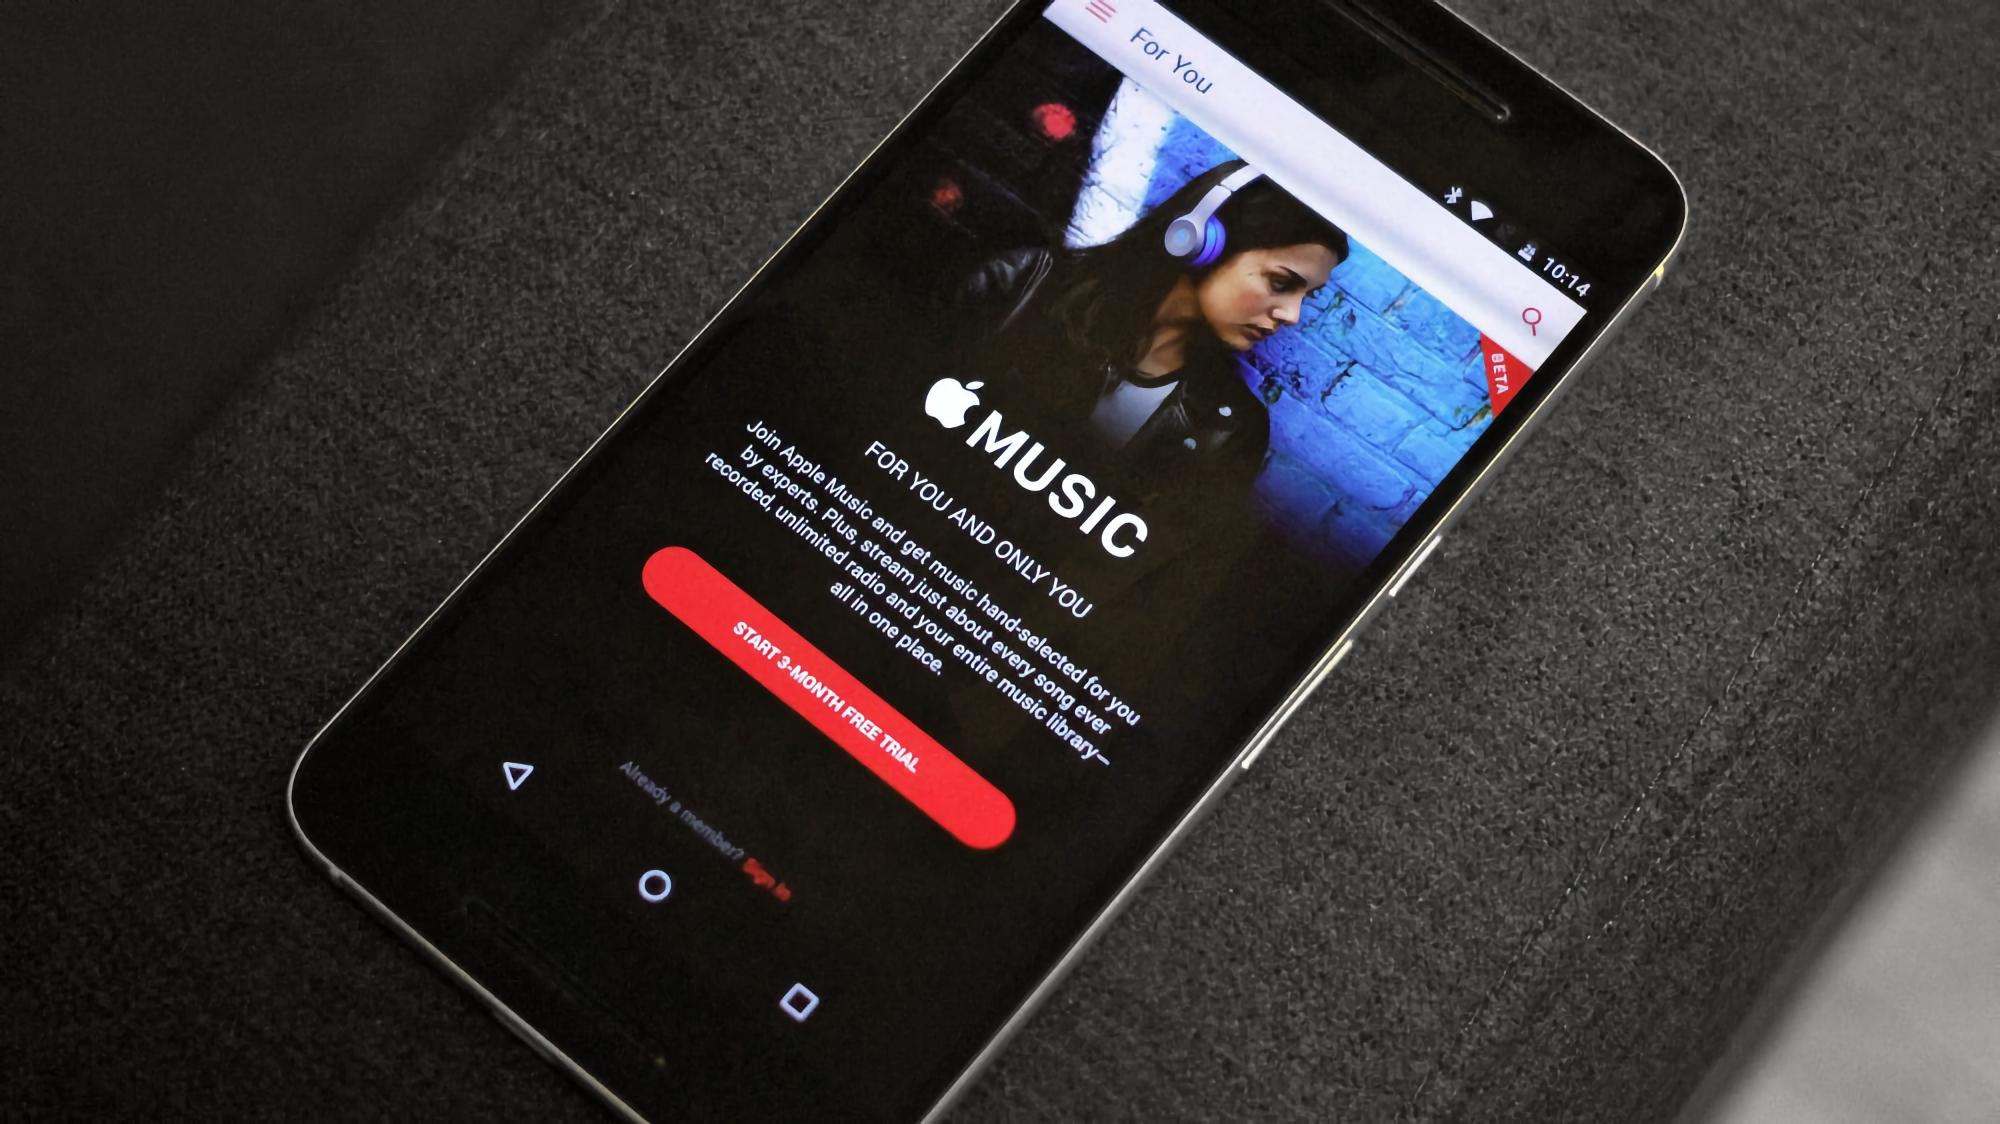 Приложение Apple Music для Android получило поддержку Spatial Audio и Lossless Audio